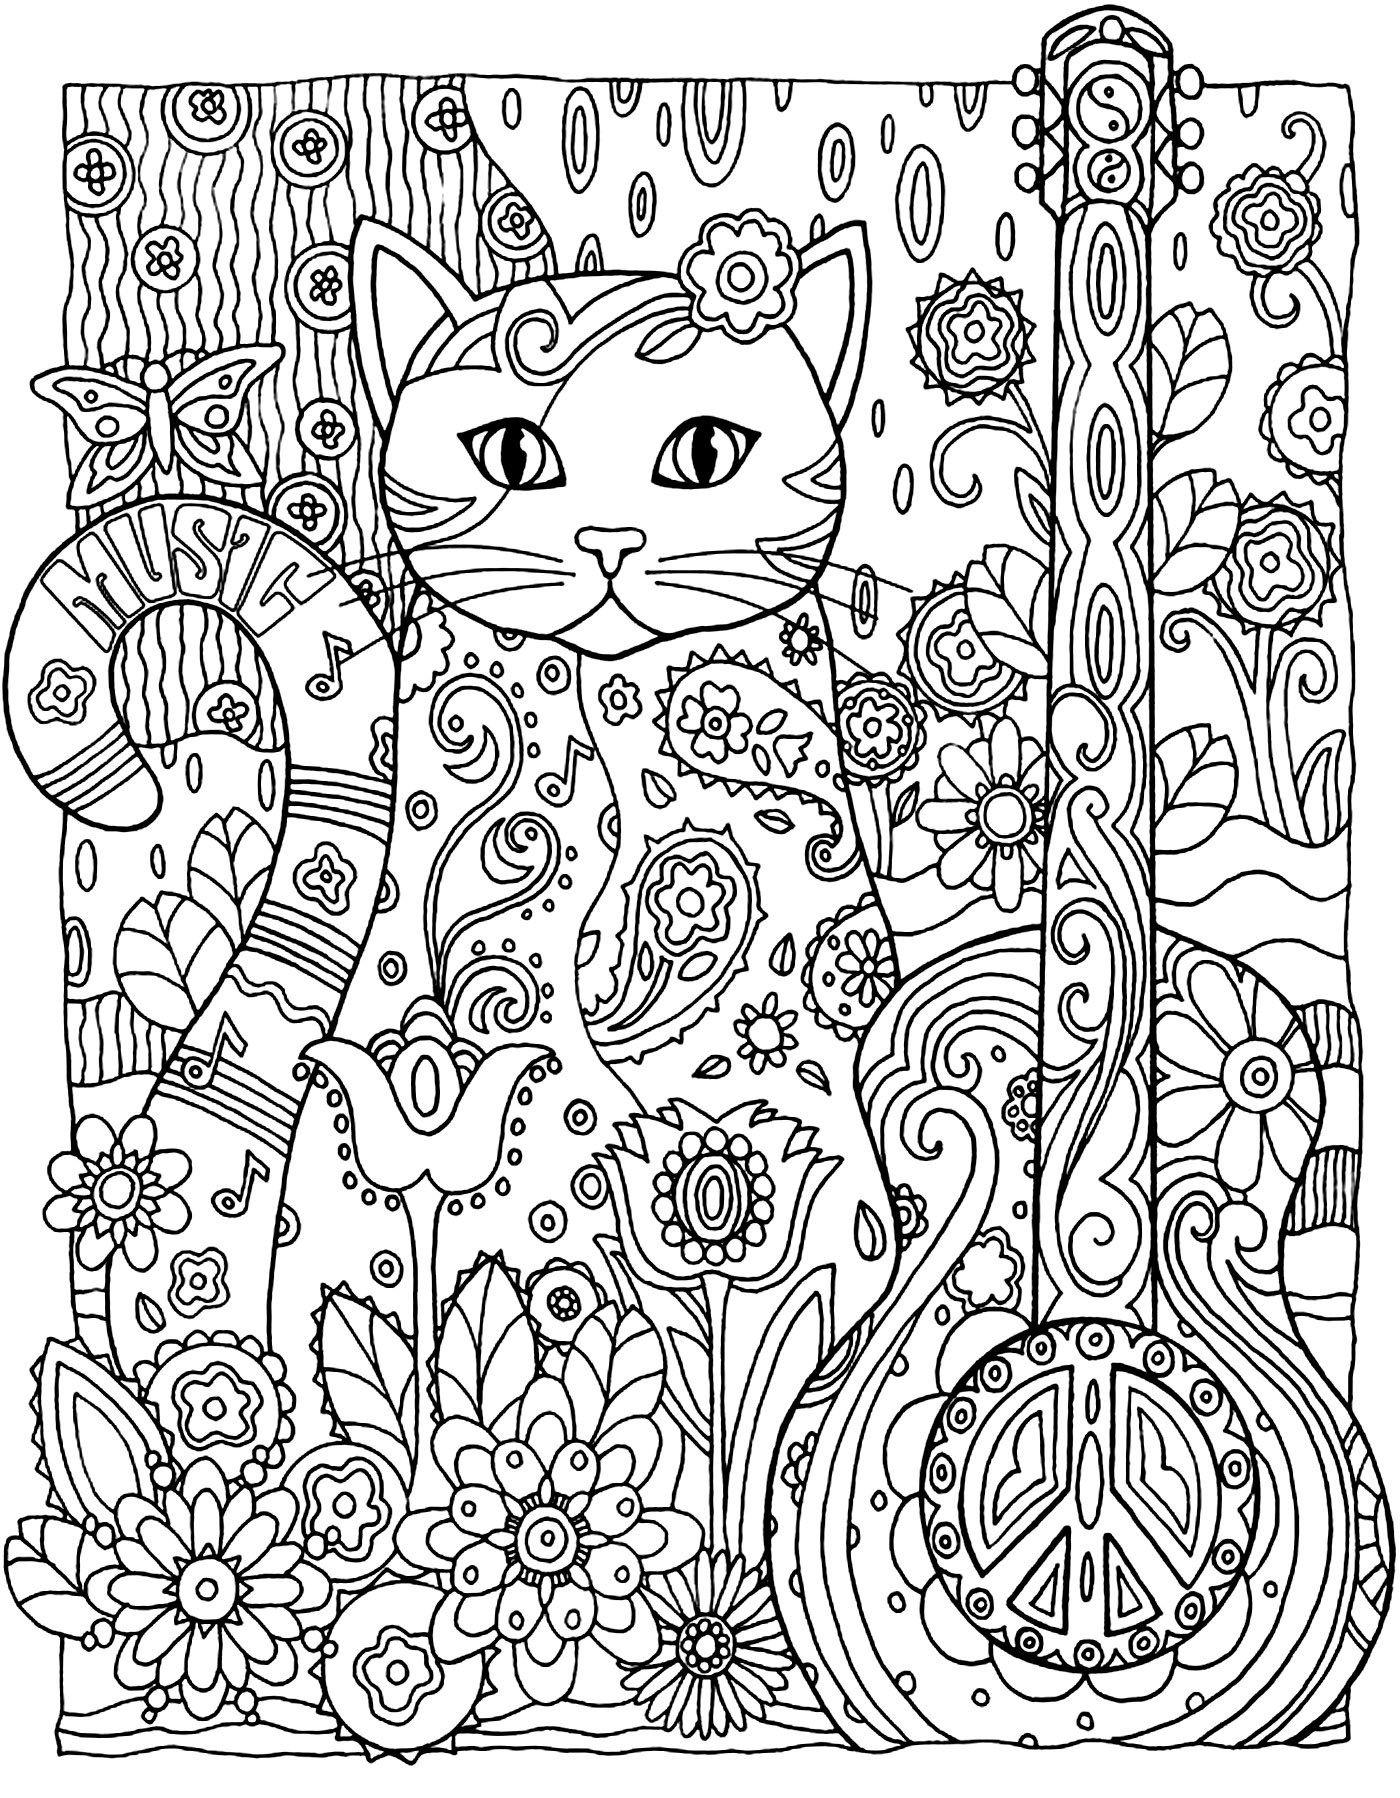 Pin de Lucia Jannett en para mestros | Pinterest | Mandalas y ...